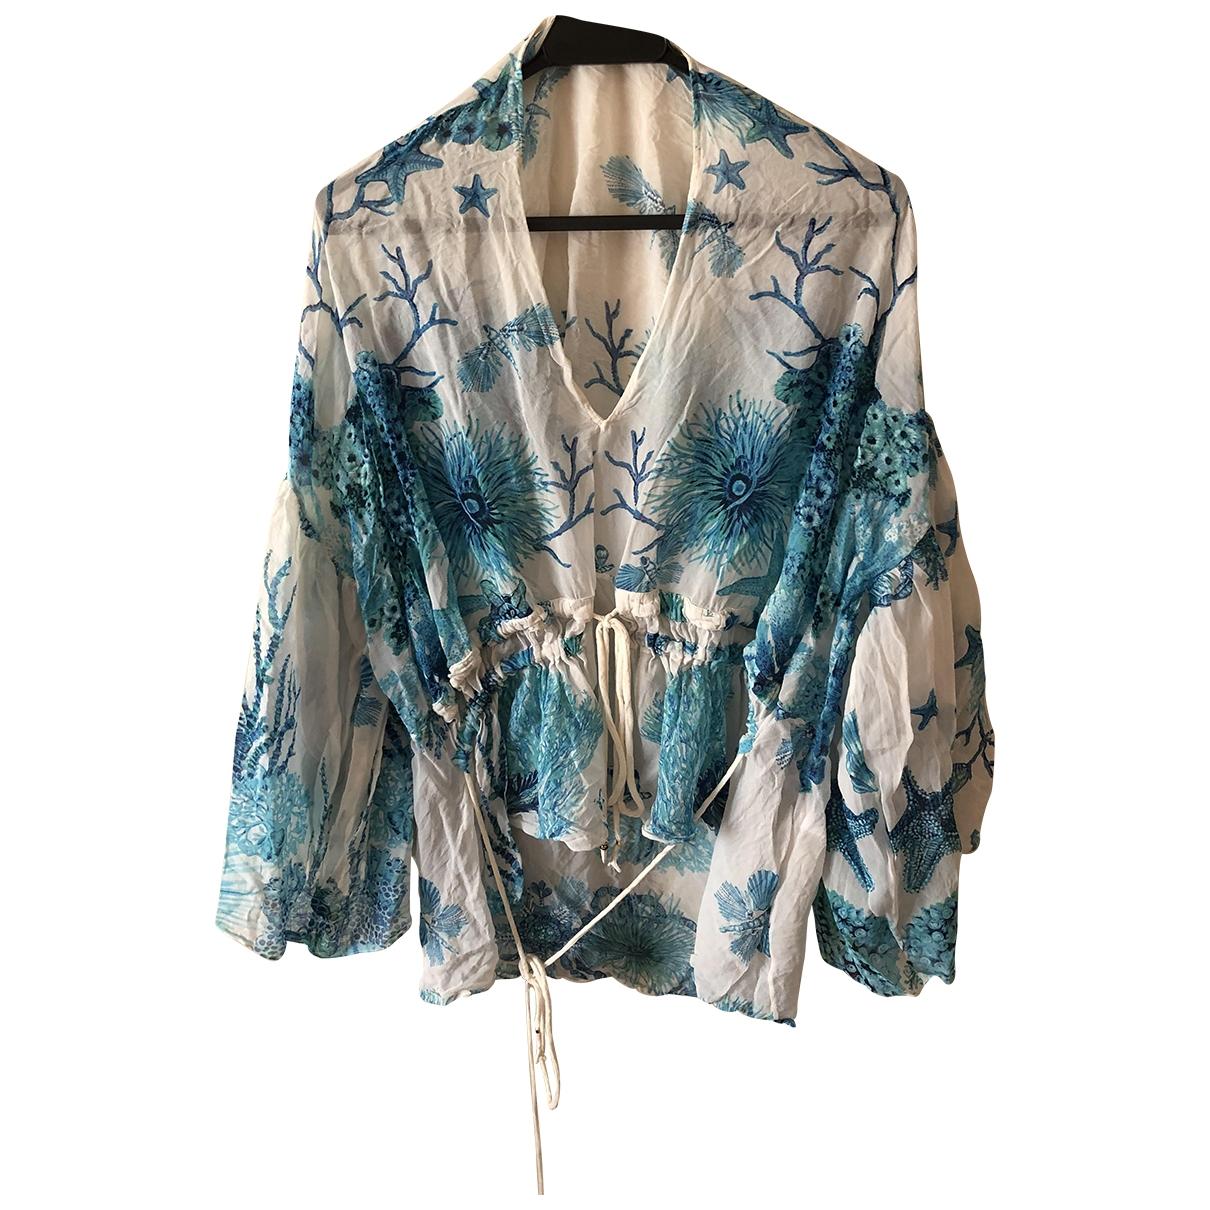 Roberto Cavalli \N Silk  top for Women 40 IT